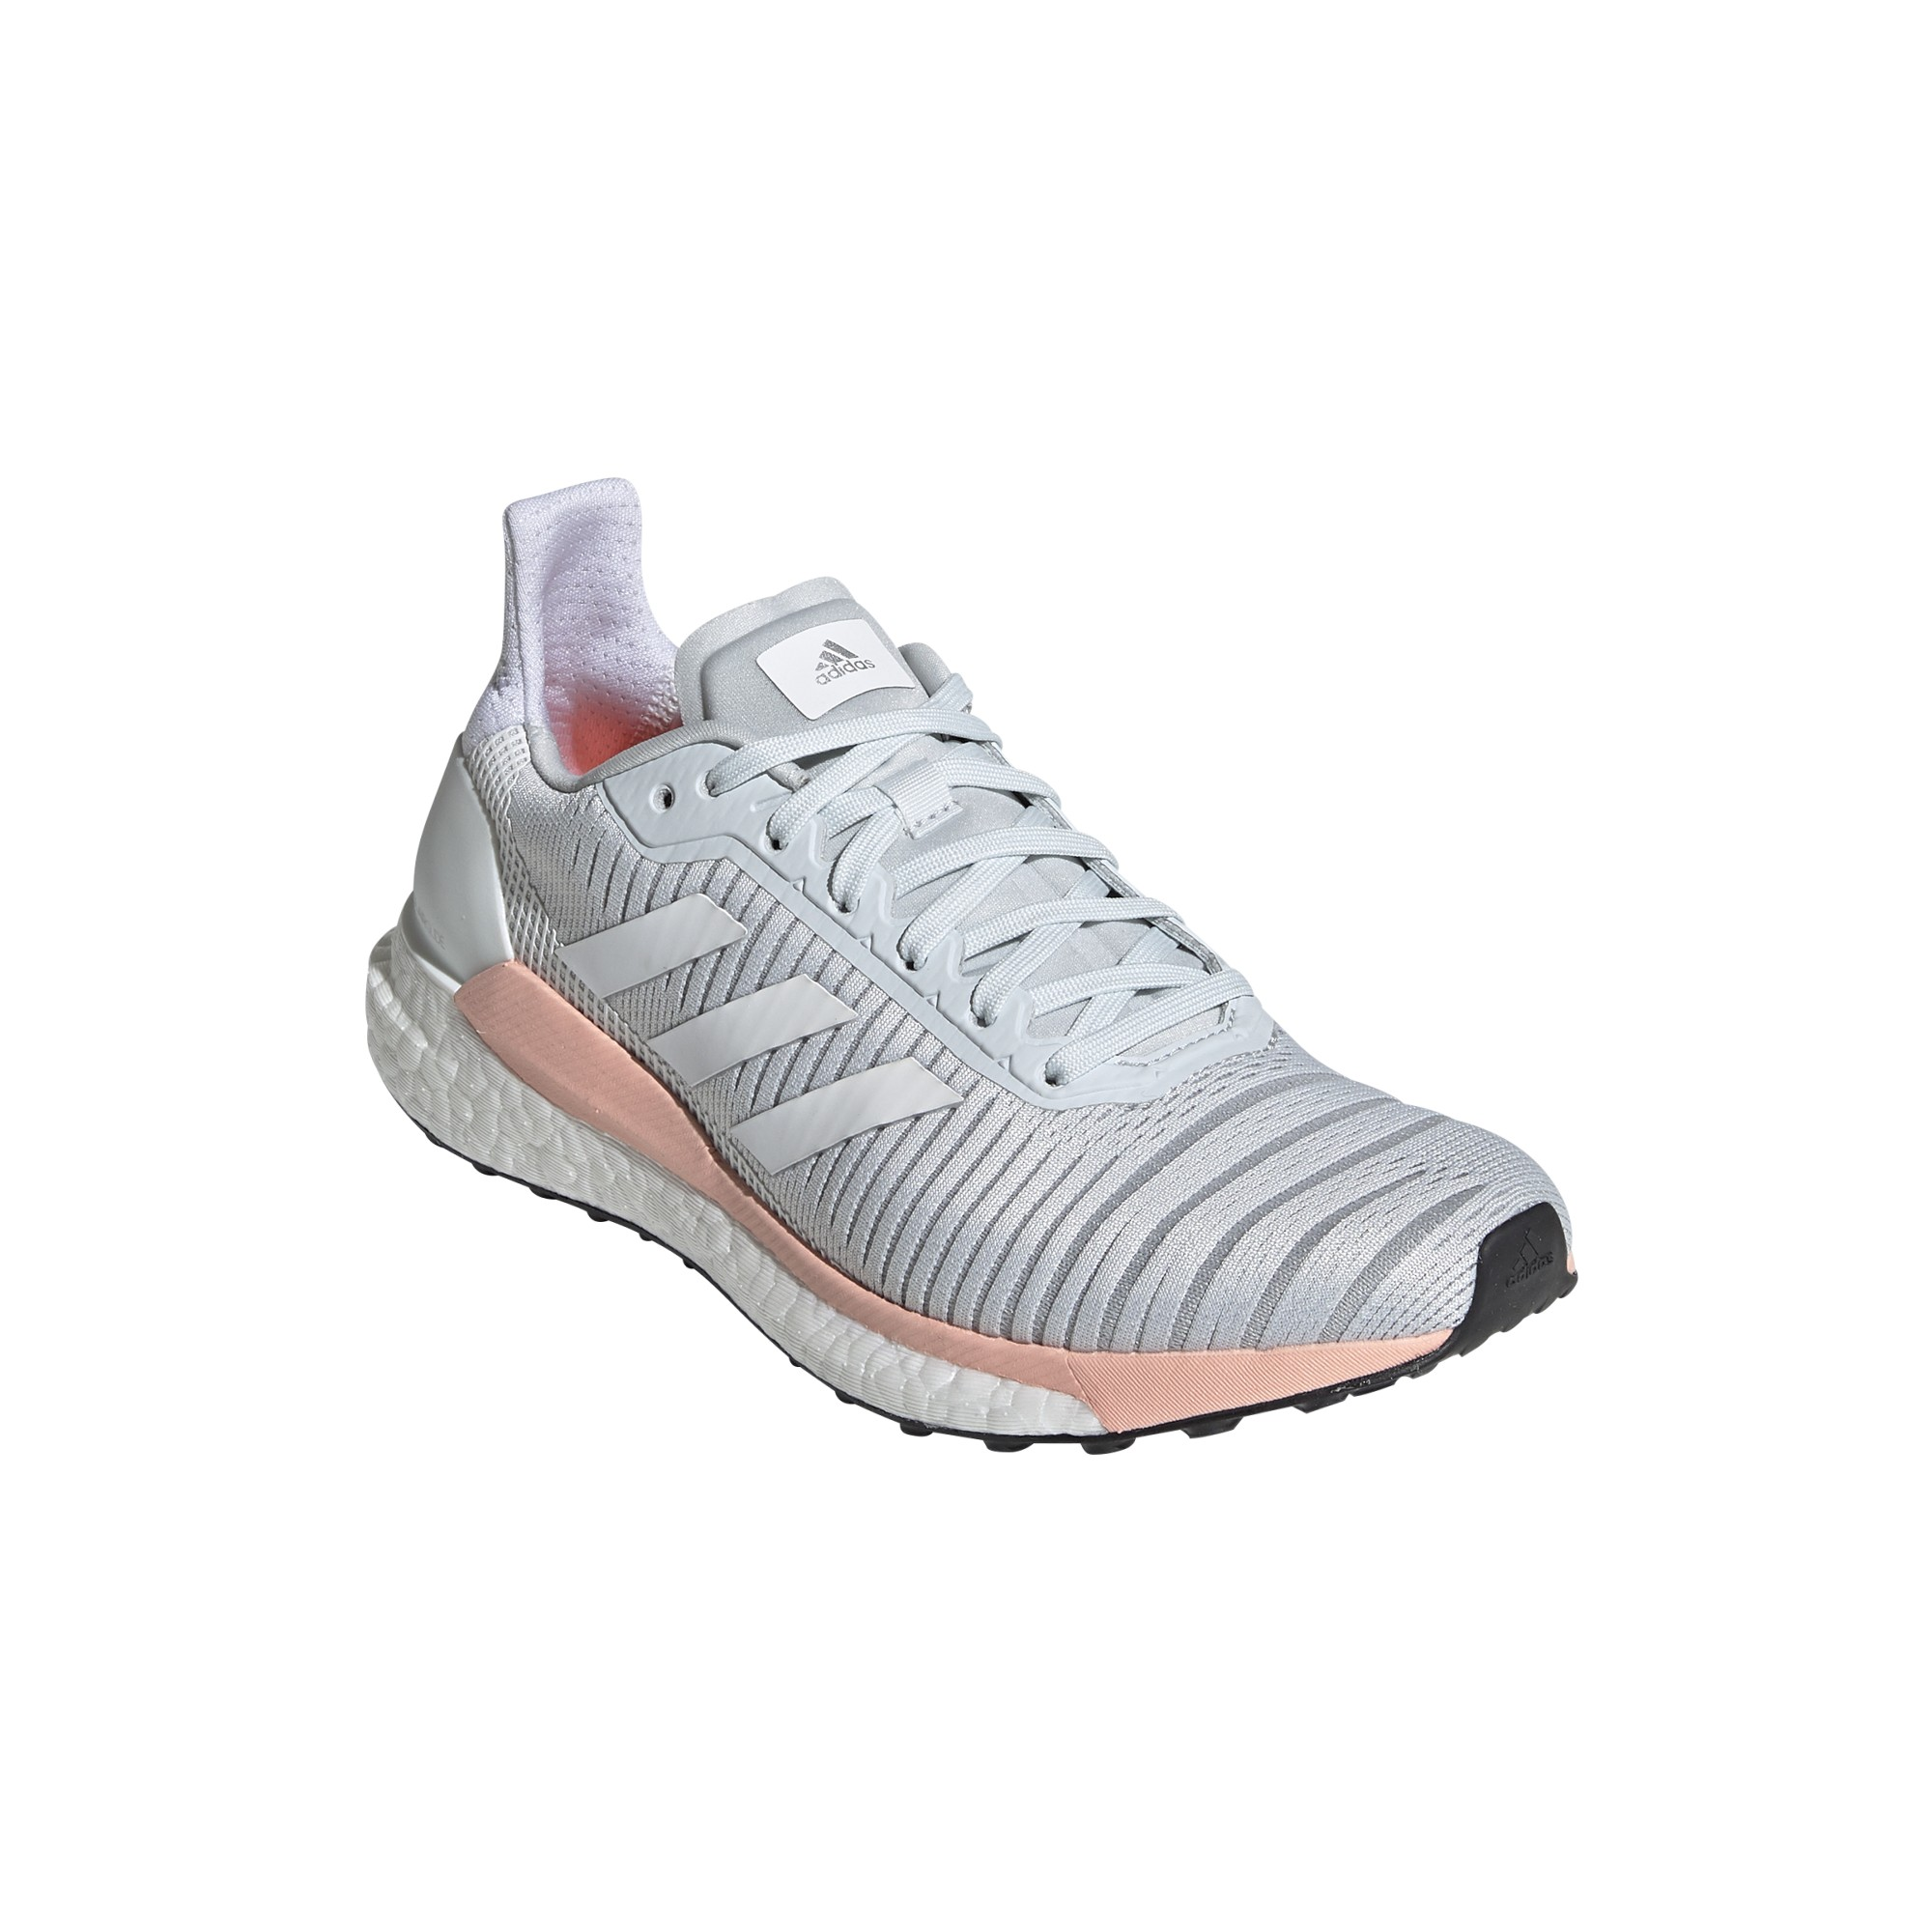 Zapatillas adidas Solar Glide G28033 - Deportes Manzanedo